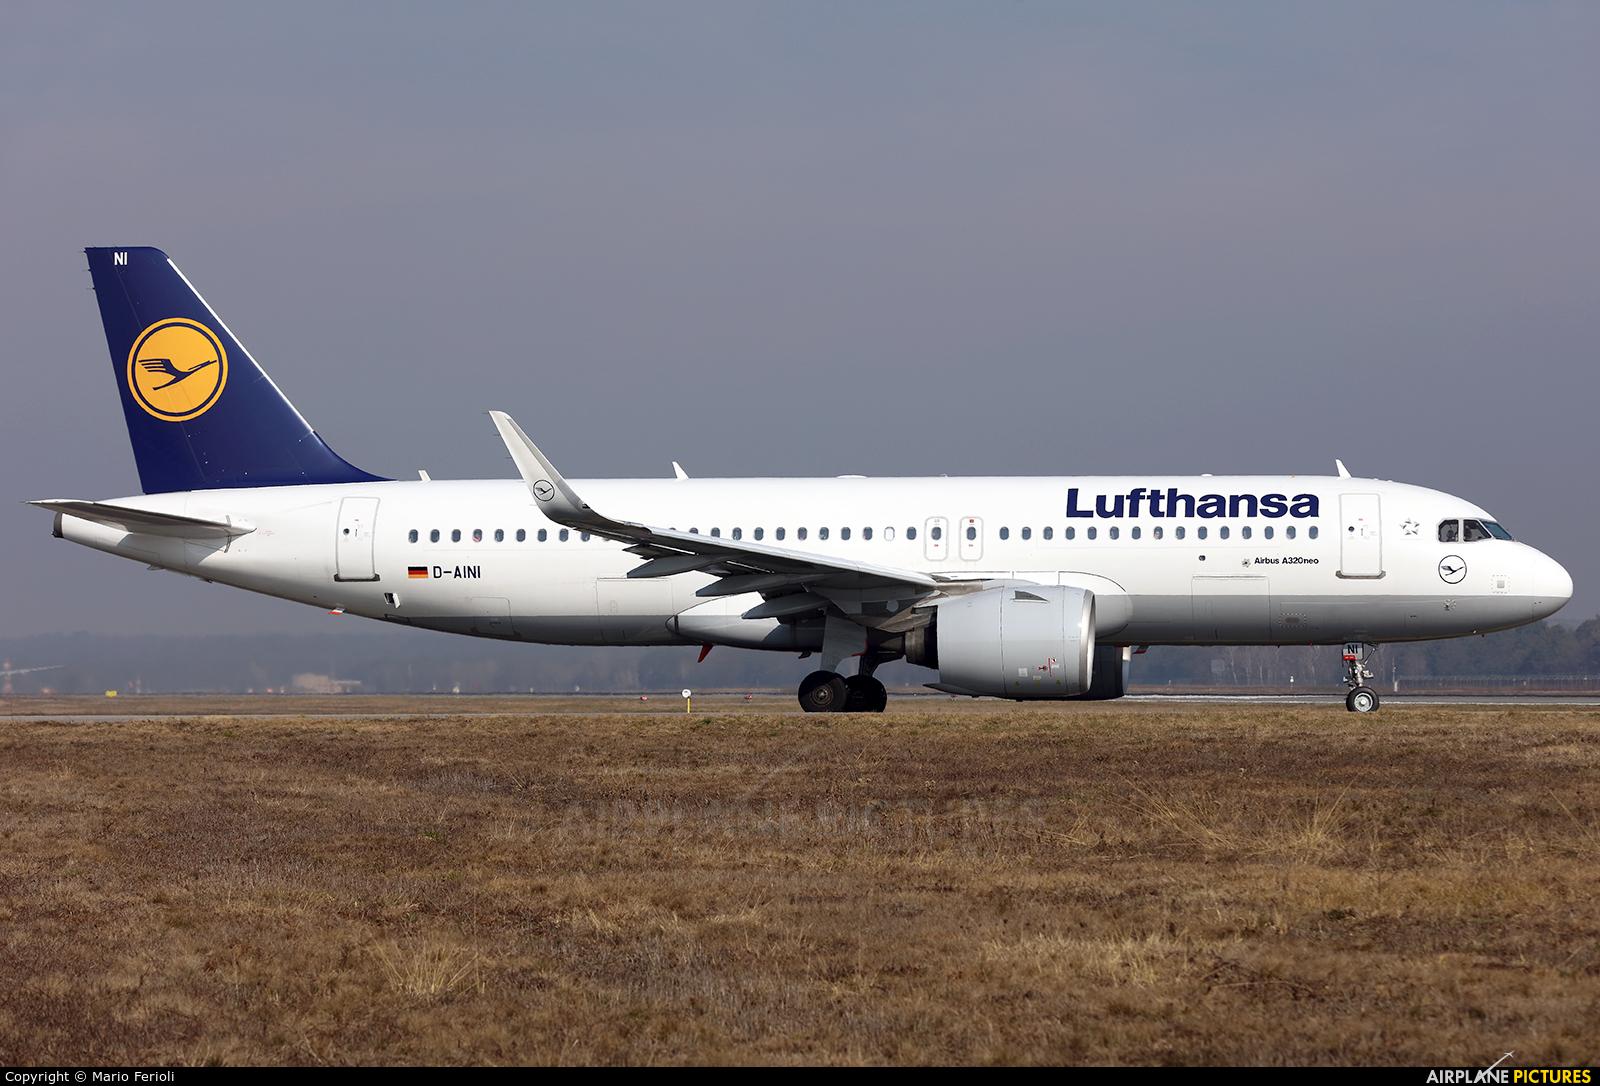 Lufthansa D-AINI aircraft at Milan - Malpensa